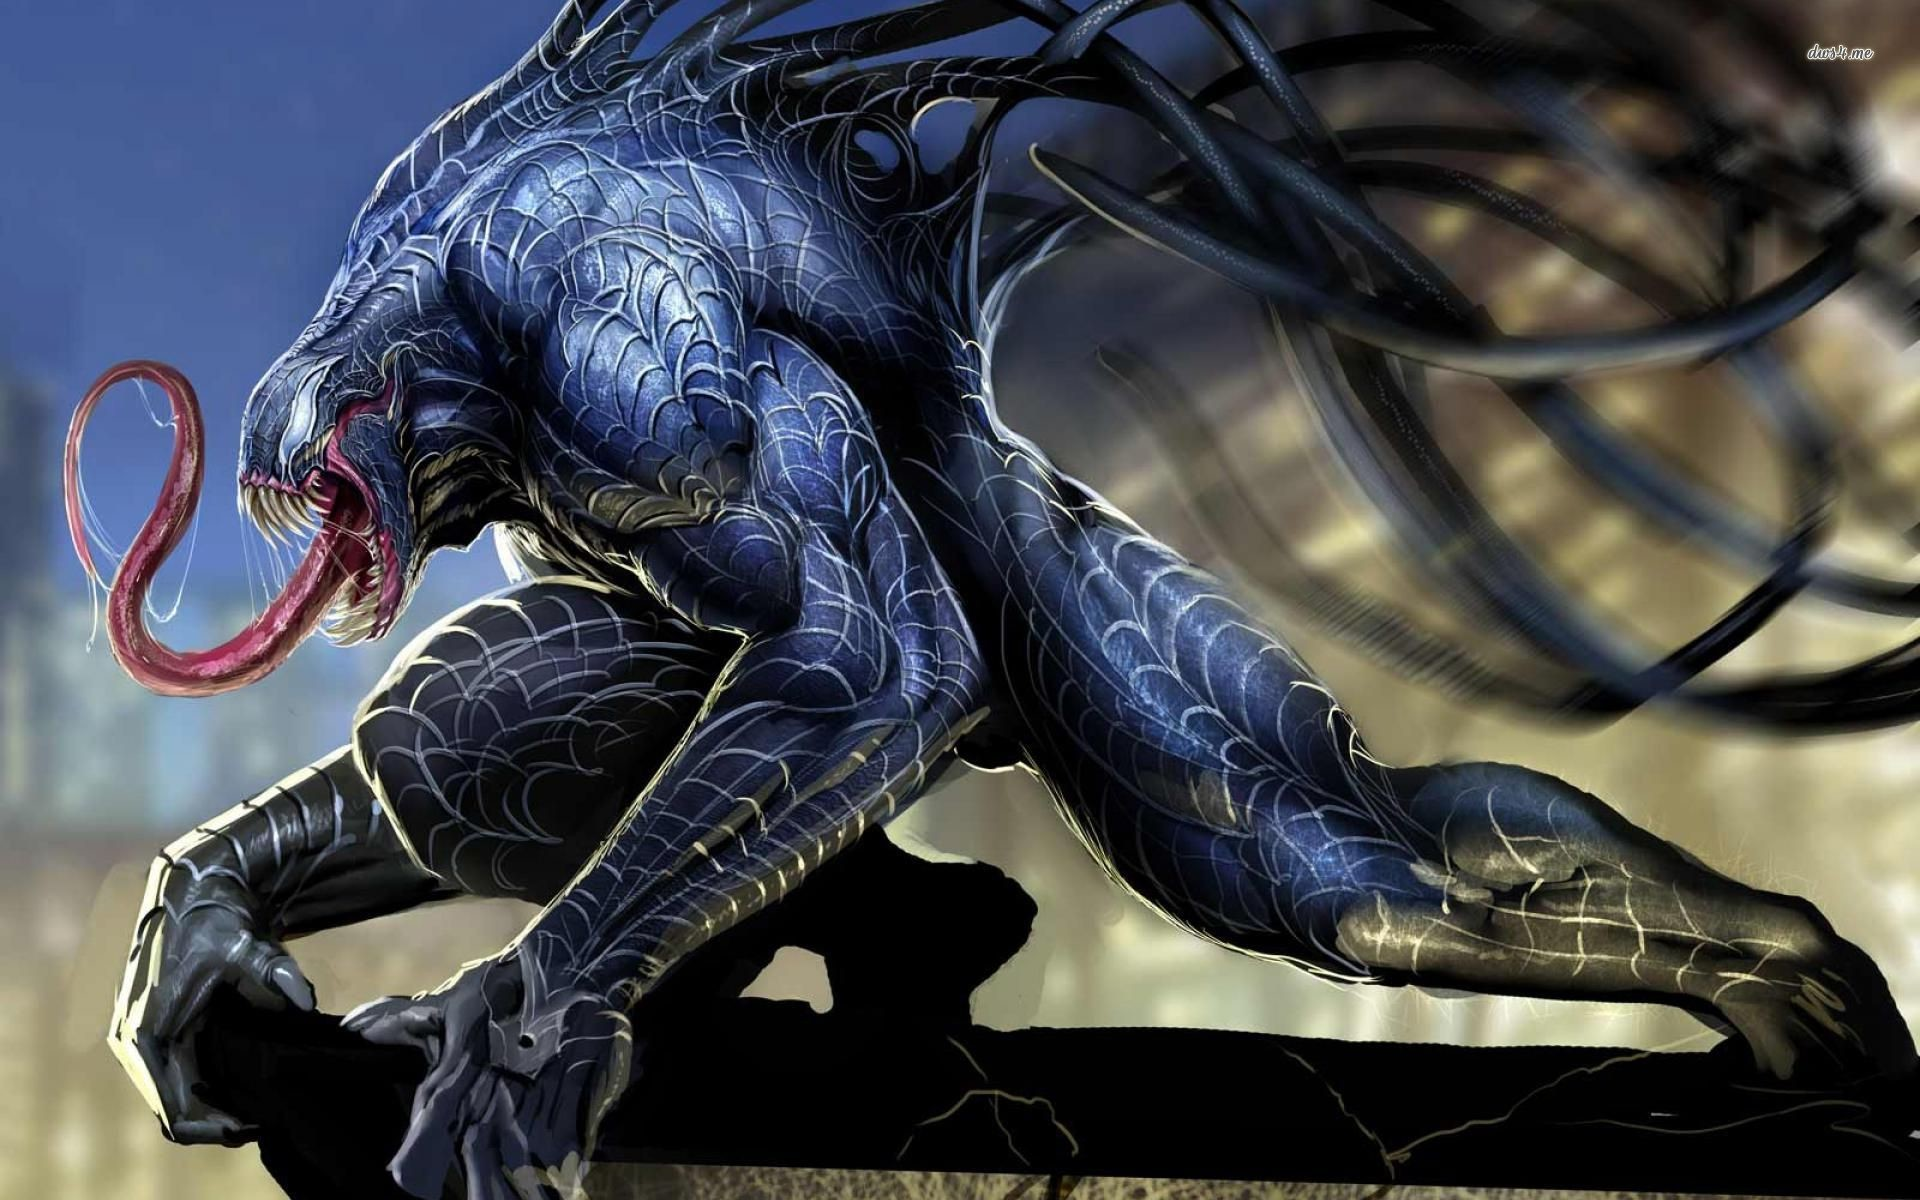 Venom wallpaper Venom Comic Wallpaper Hd